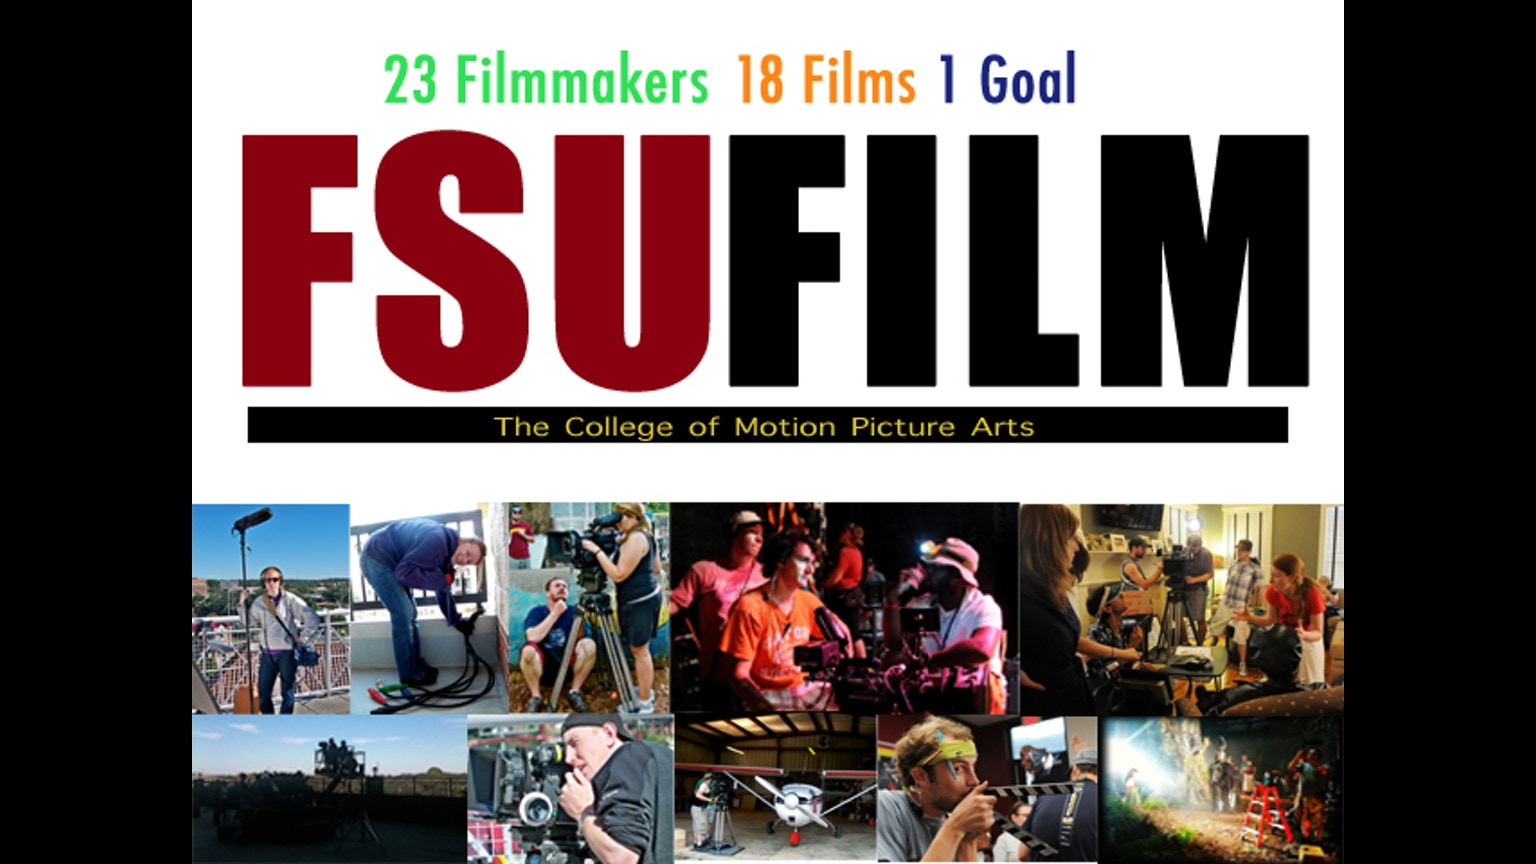 Fsu masters thesis